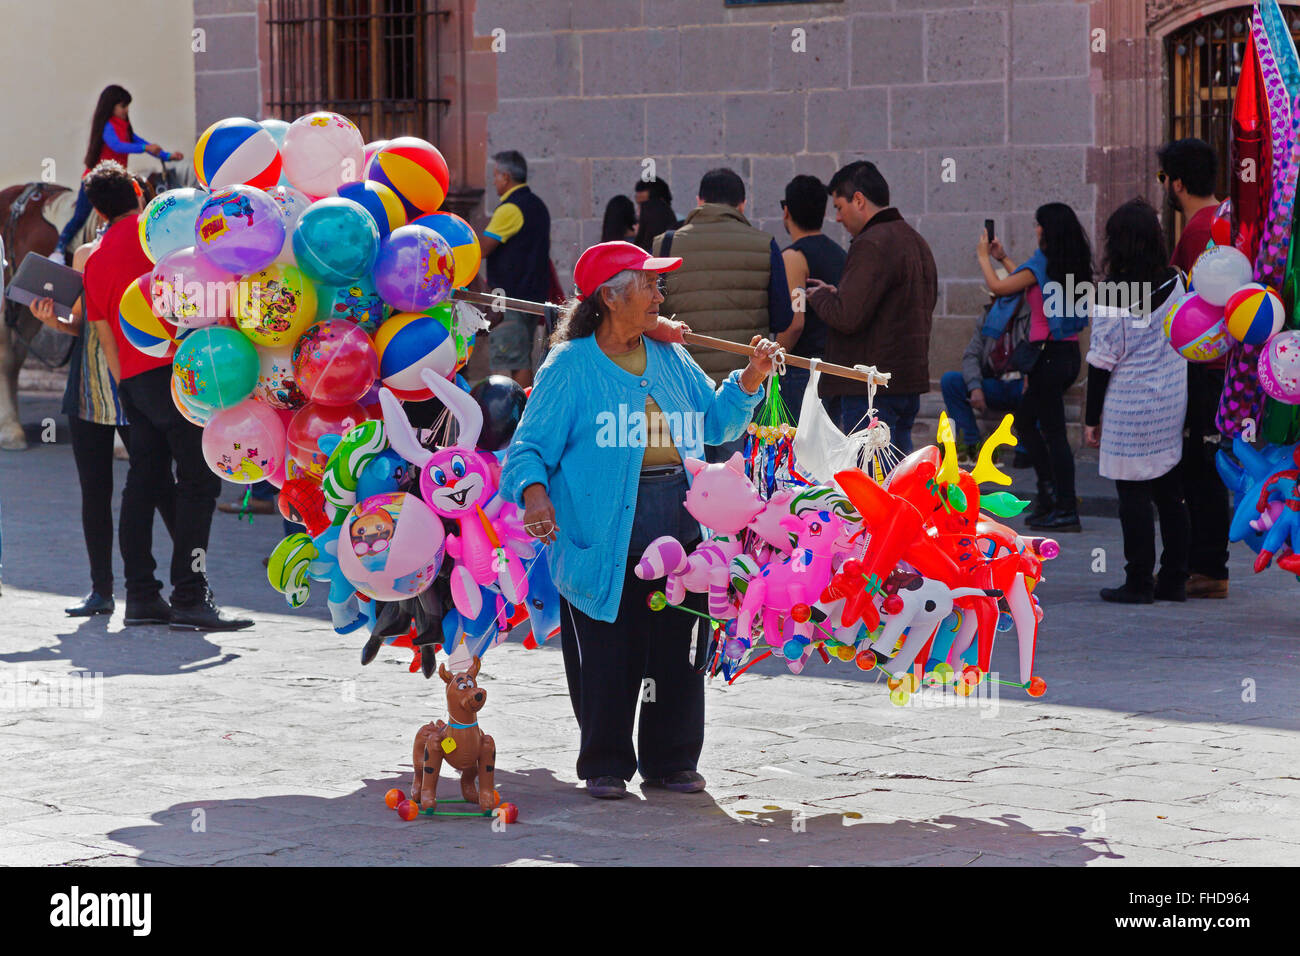 Woman selliing balloons in the Jardin - SAN MIGUEL DE ALLENDE, MEXICO - Stock Image